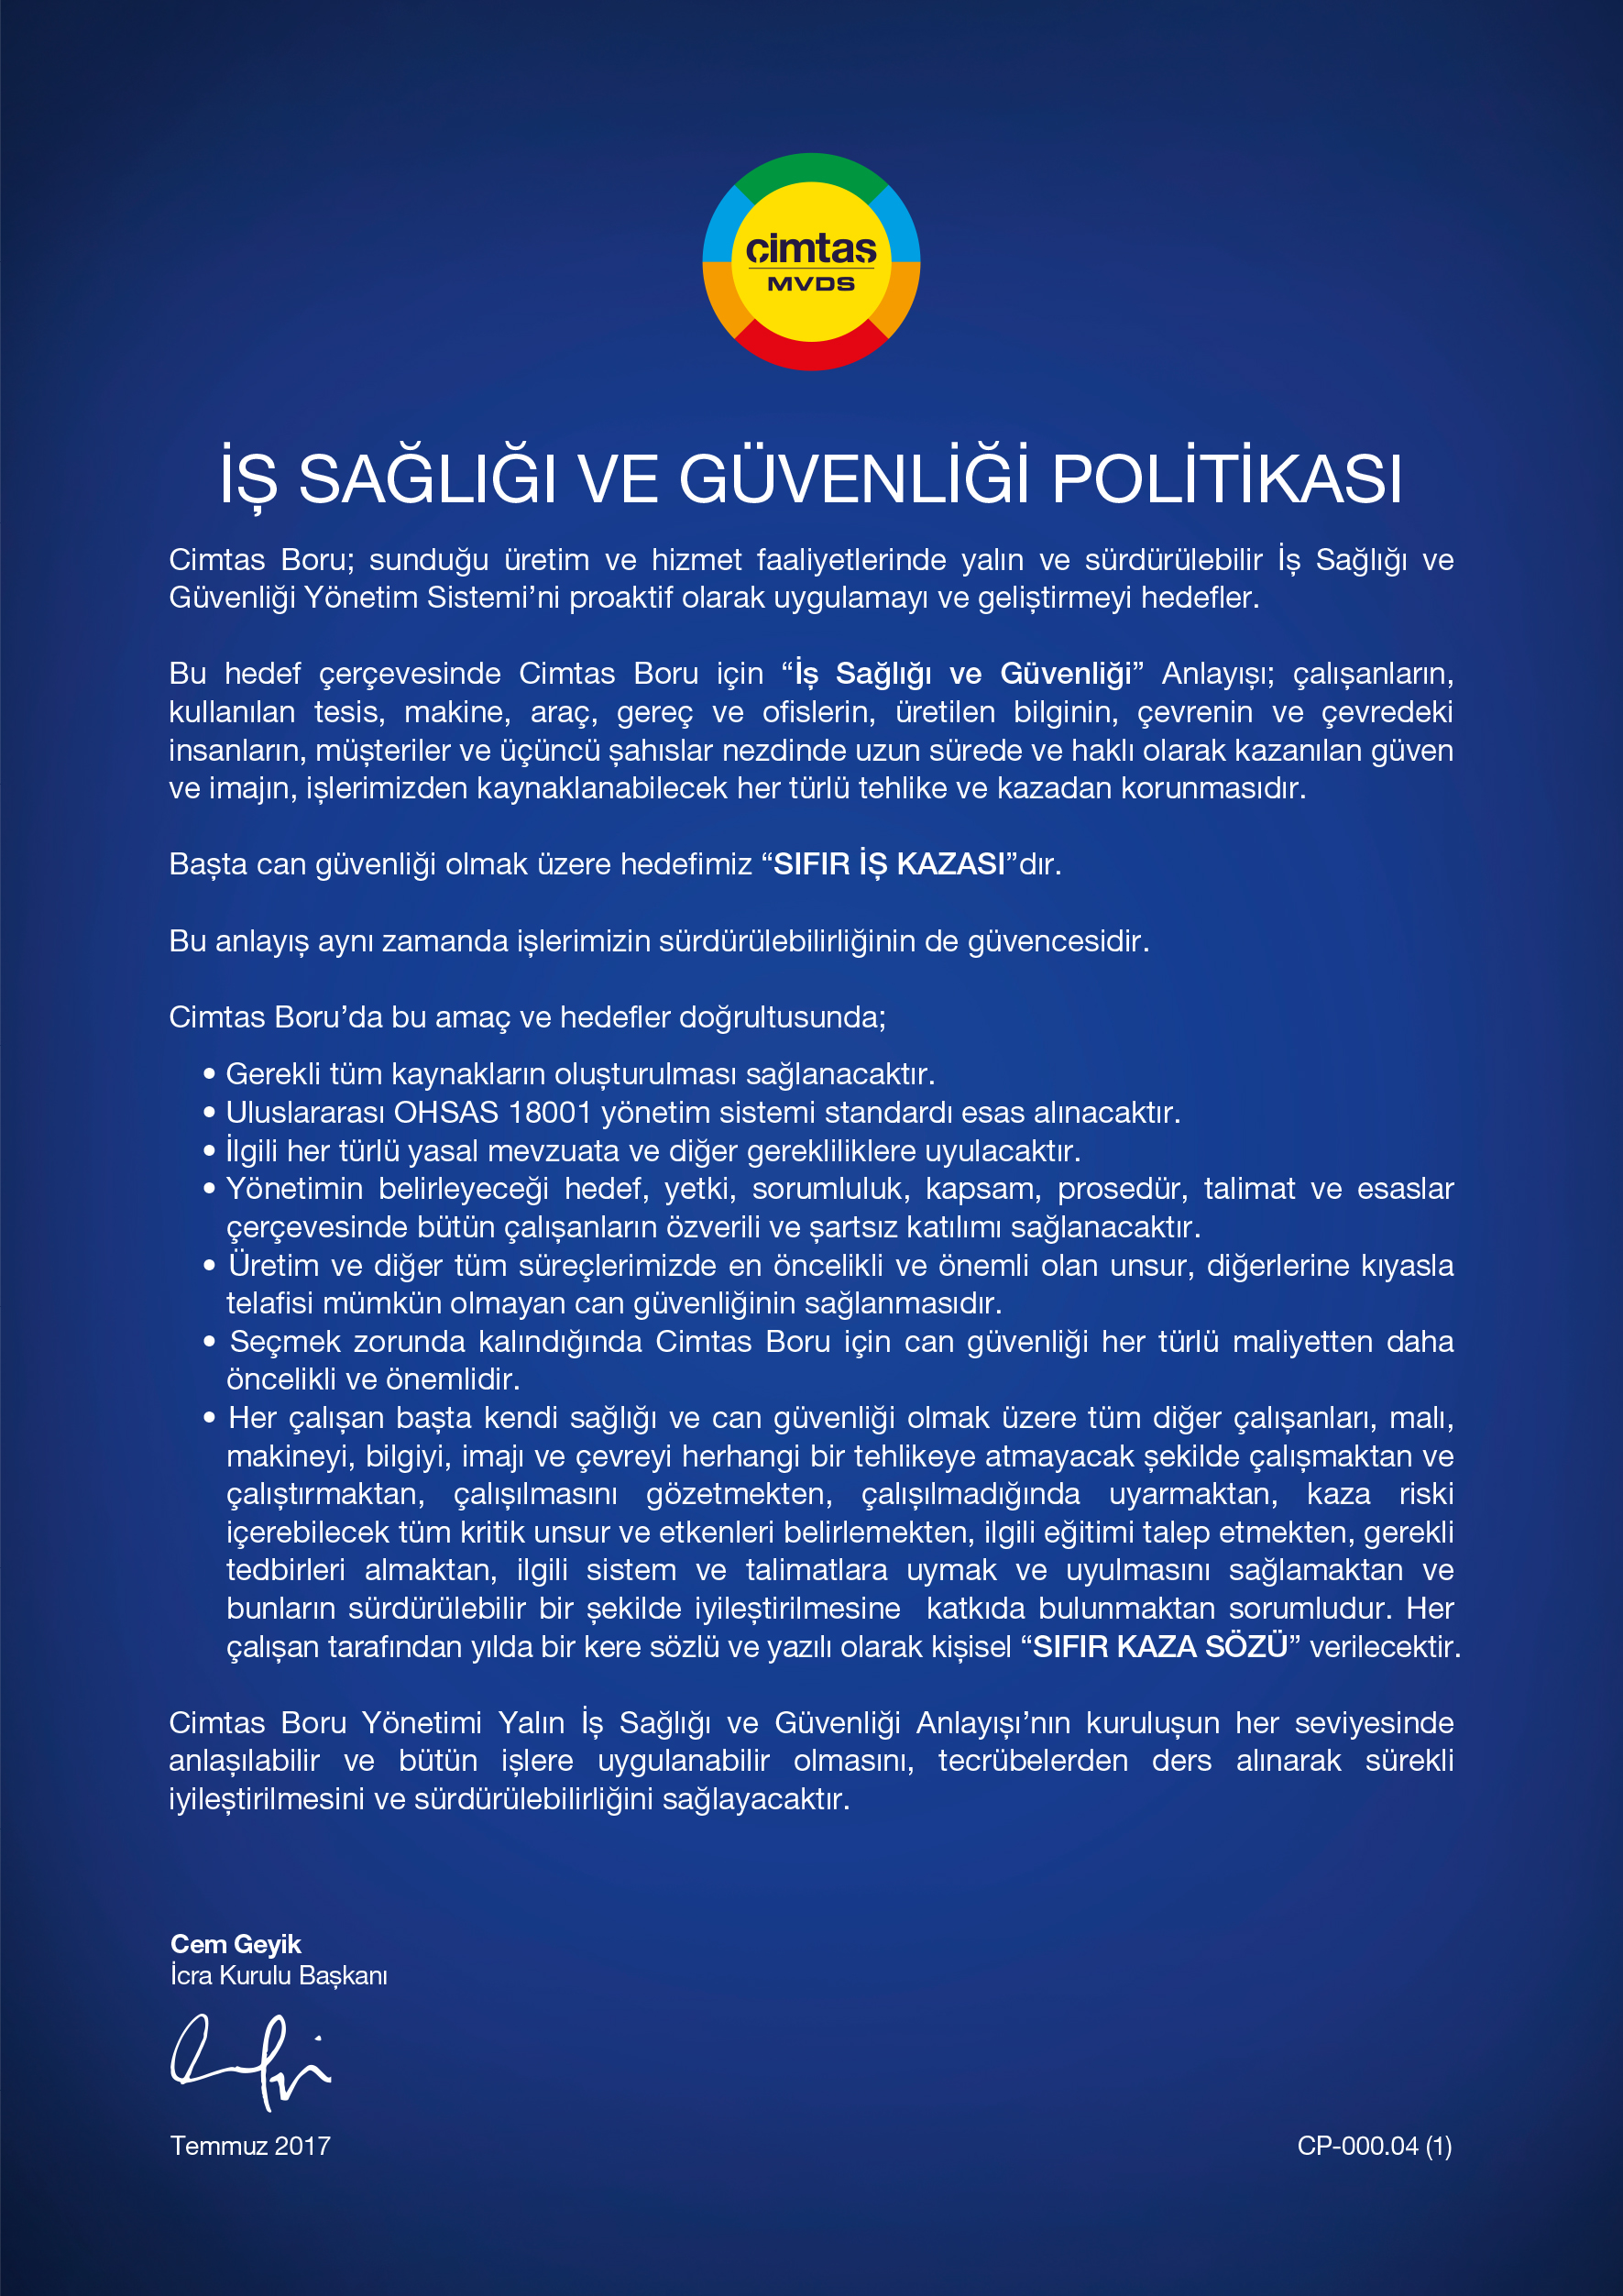 ISG_Politikasi